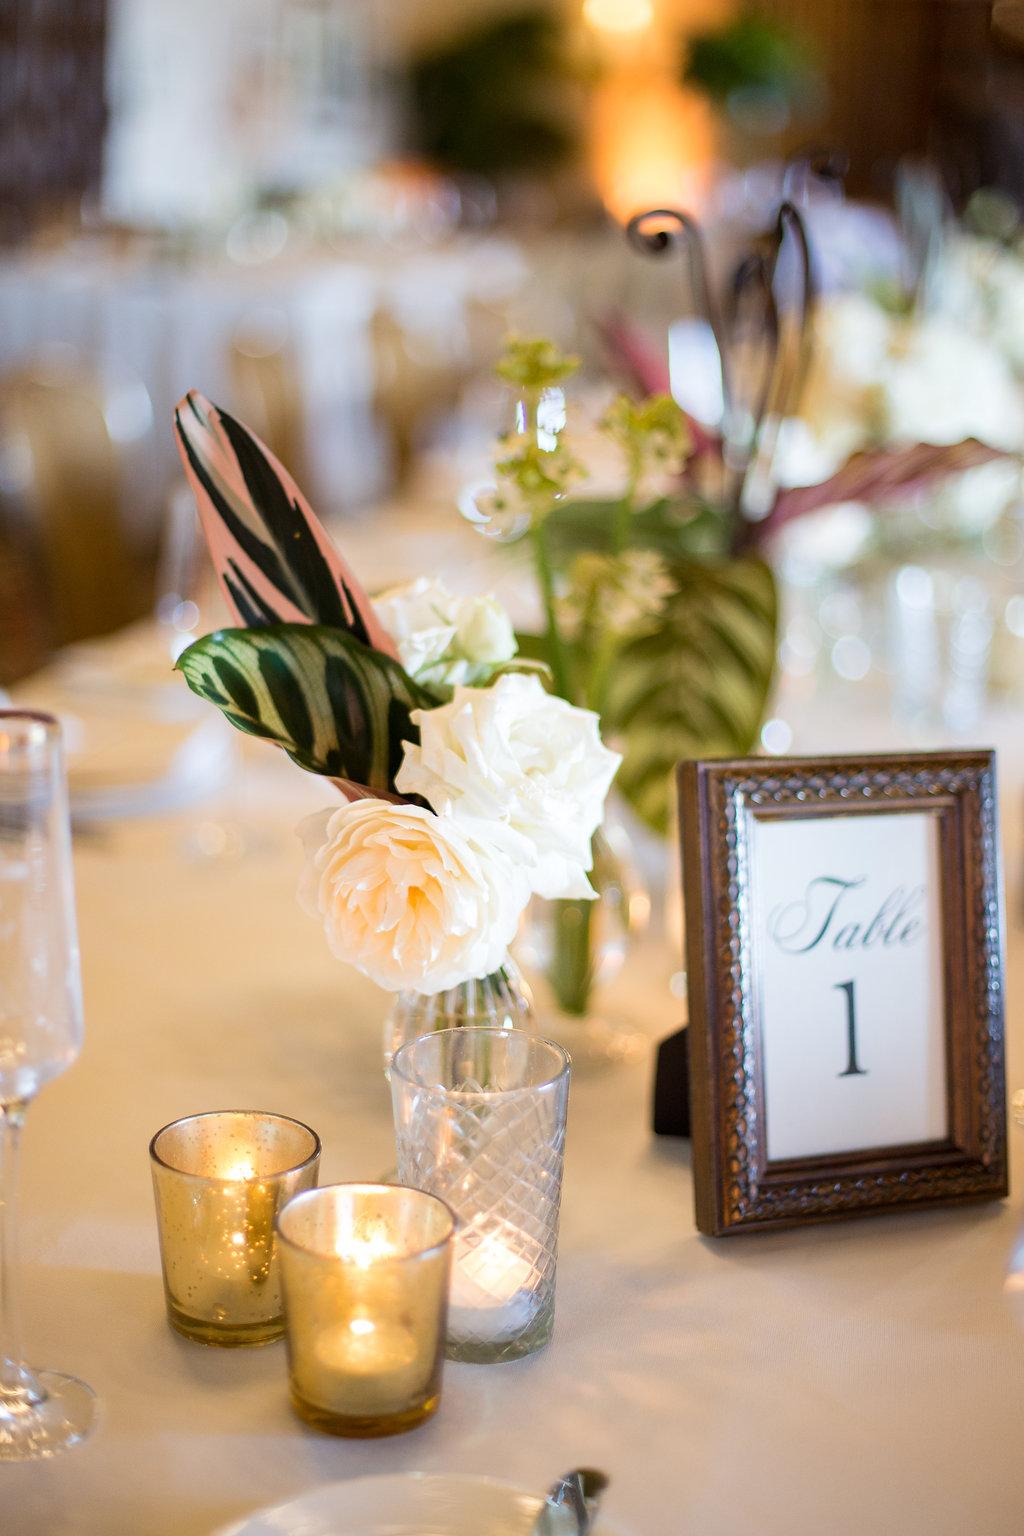 www.santabarbarawedding.com | Melissa Musgrove Photography | Four Seasons Resort The Biltmore | Reception | Table Number